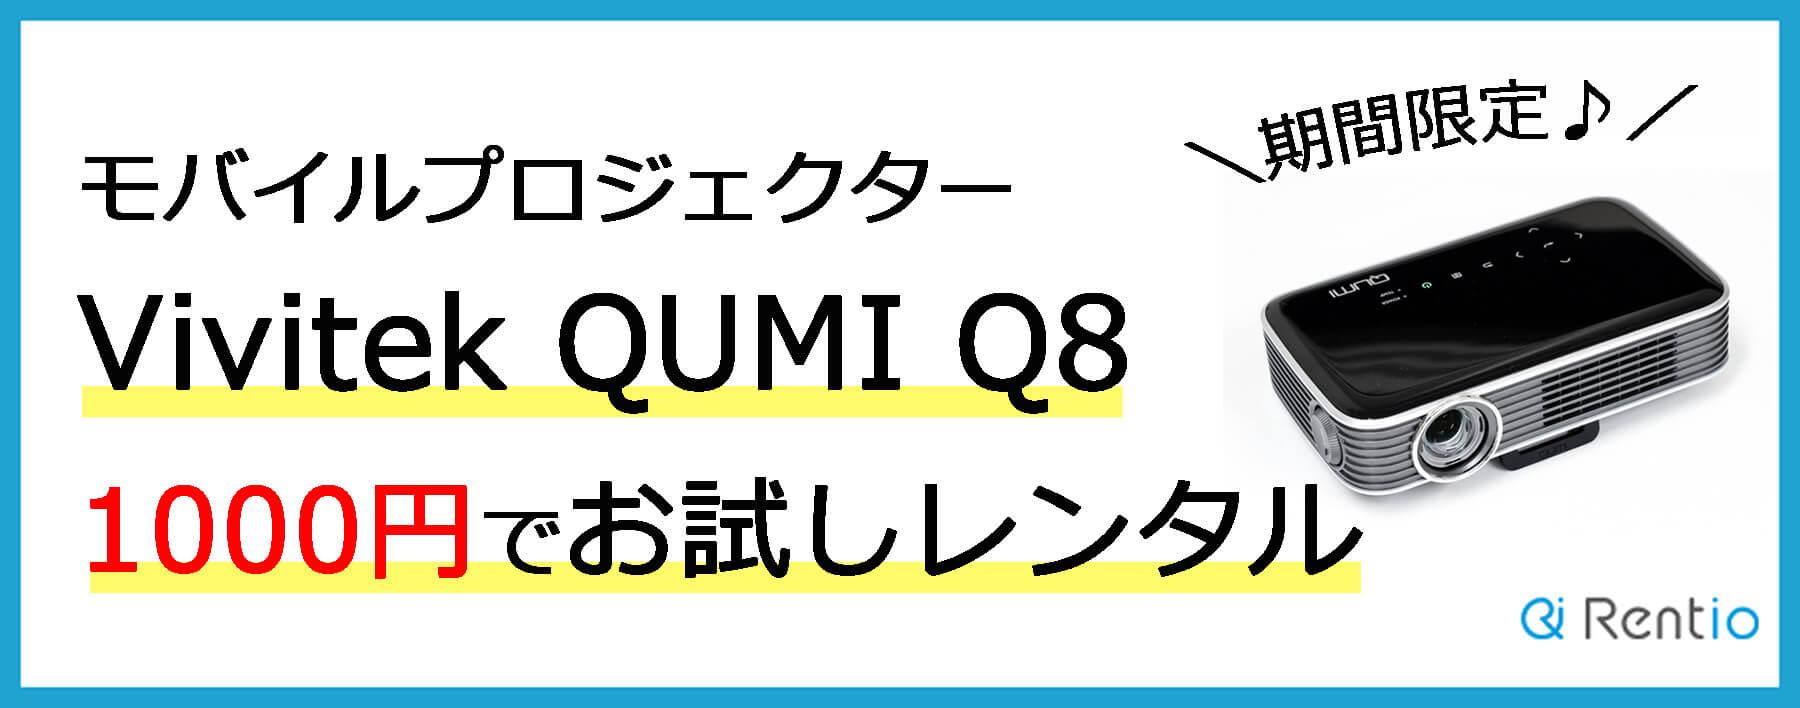 Vivitek QUMI Q8 1000円レンタルキャンペーン